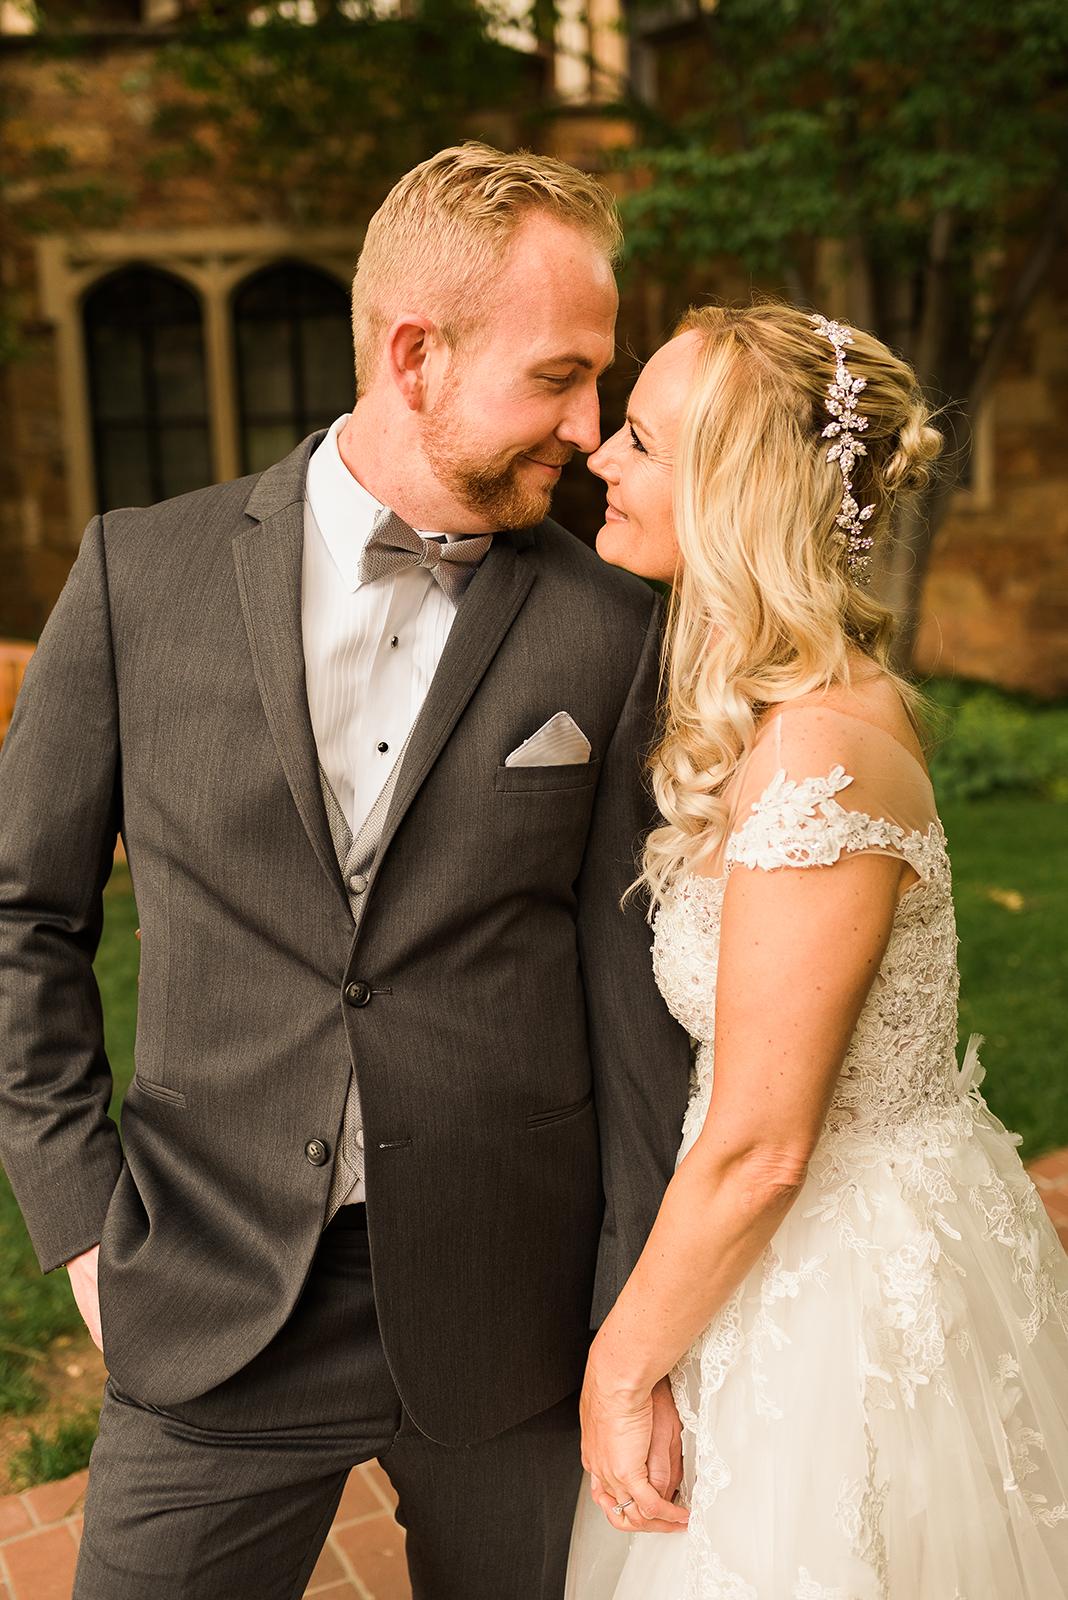 Glen Eyrie Castle Wedding in Colorado Springs